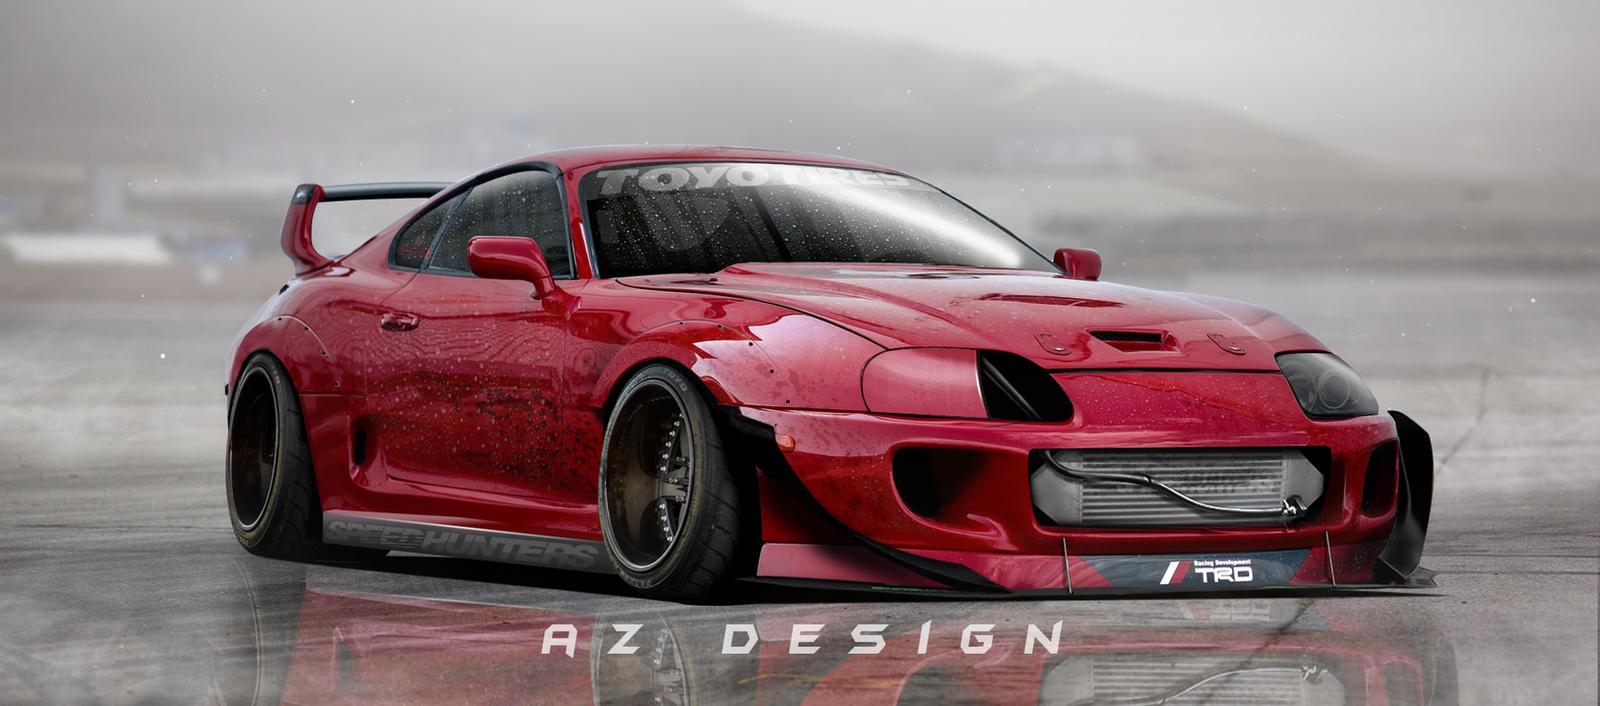 Toyota Supra Rocket Bunny By Azdesign1 On Deviantart